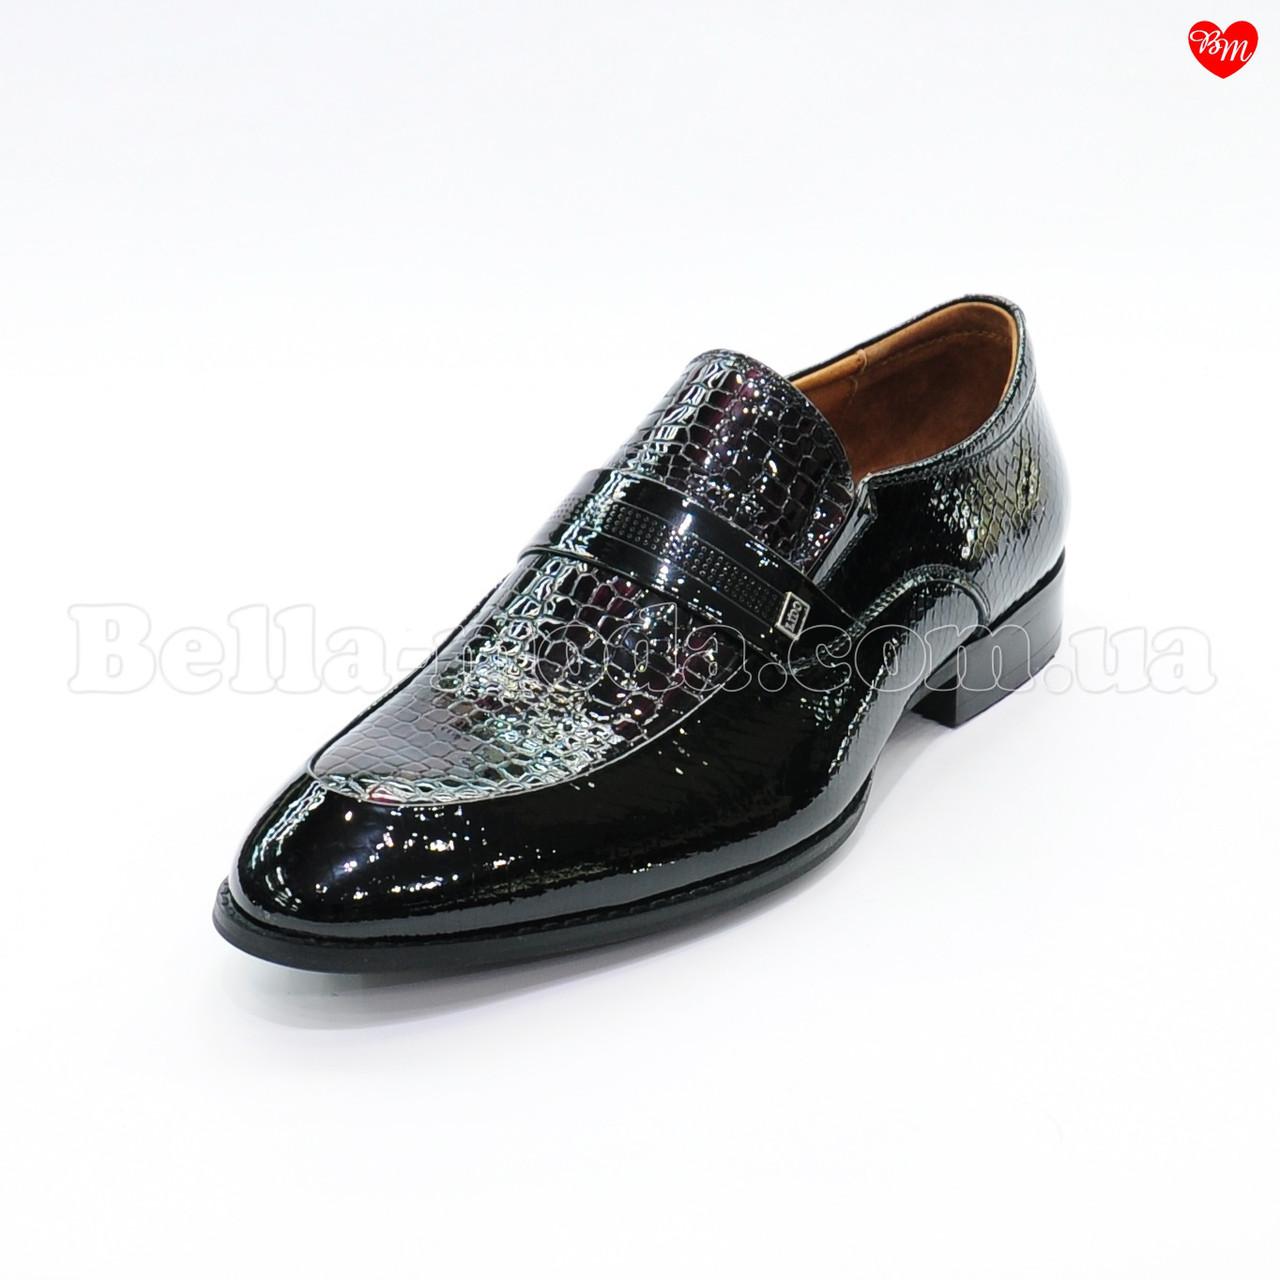 28444e13822f79 Мужские лаковые туфли хамелеон - интернет-магазин